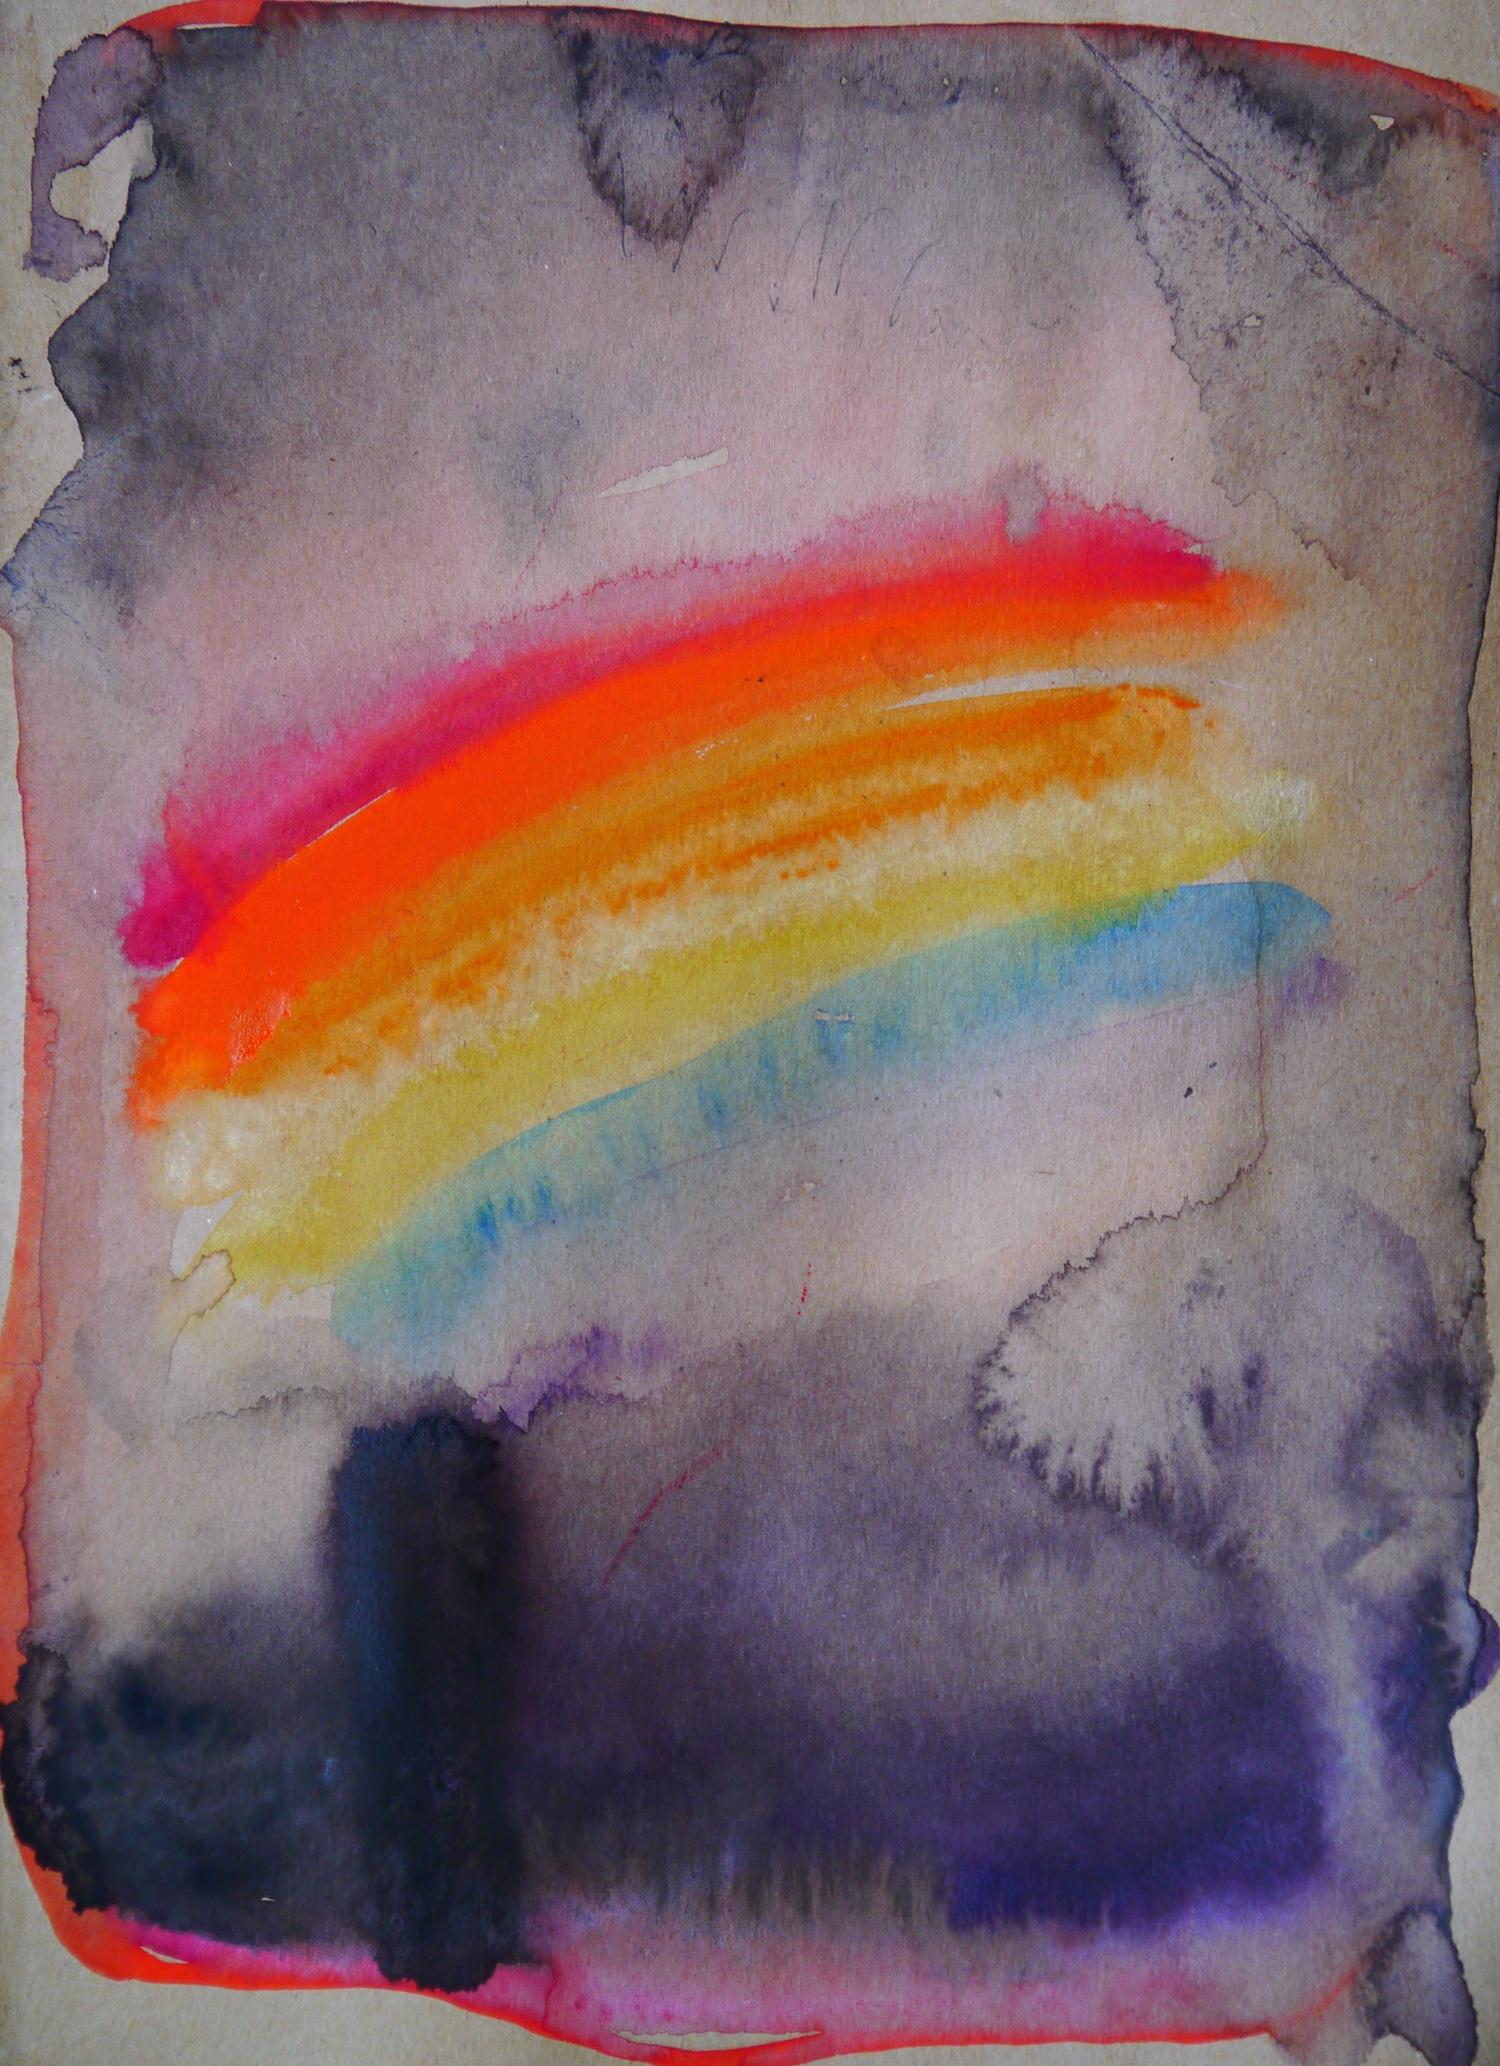 painting art space watercolor geometry geometrie aquarell cosmos cosmic malerei universe universum formen colorful silence aesthetic  kunst rainbow